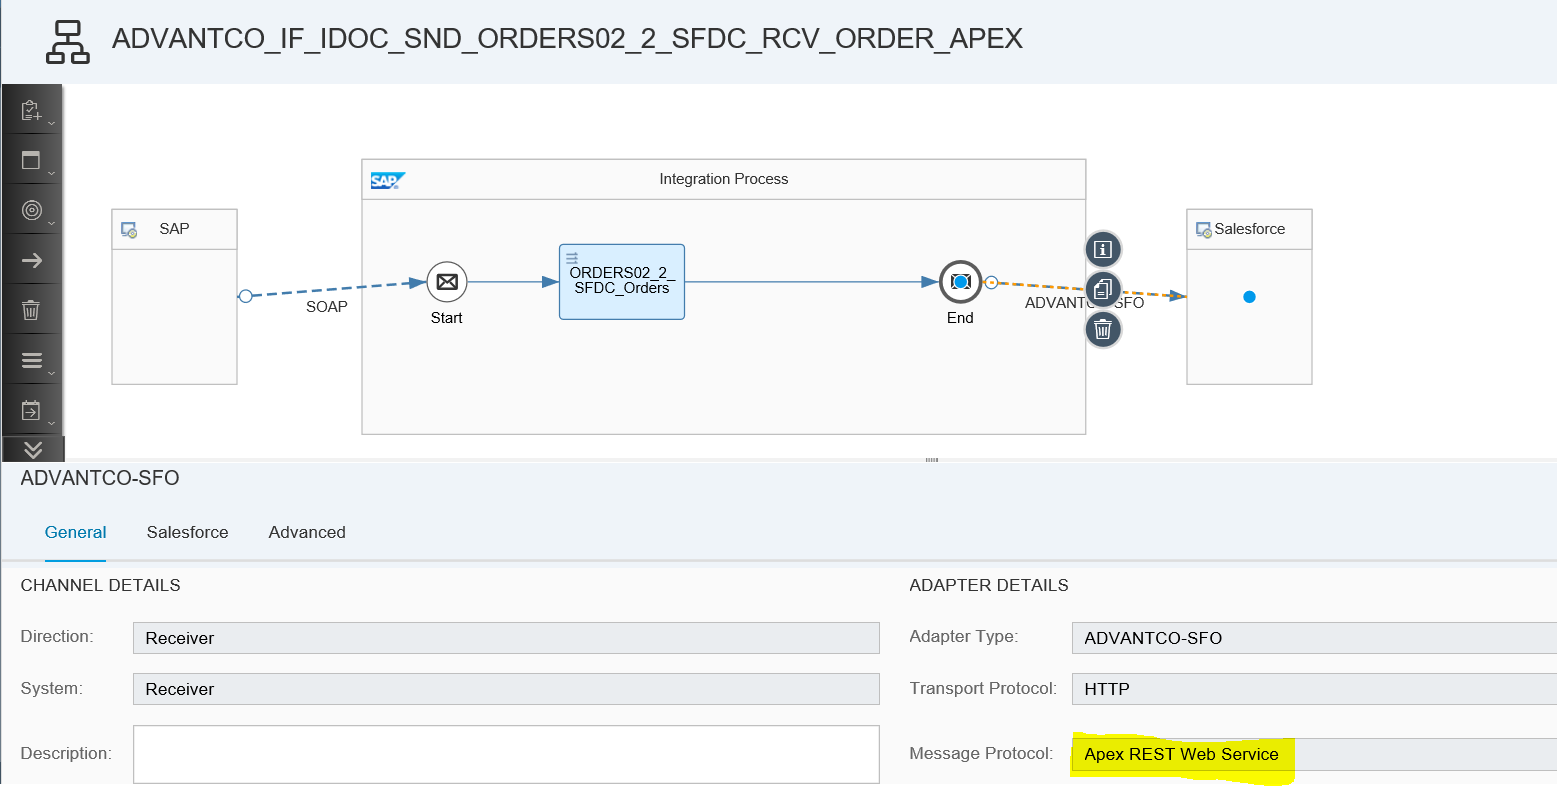 Advantco Salesforce APEX AddOn – exposing APEX REST services